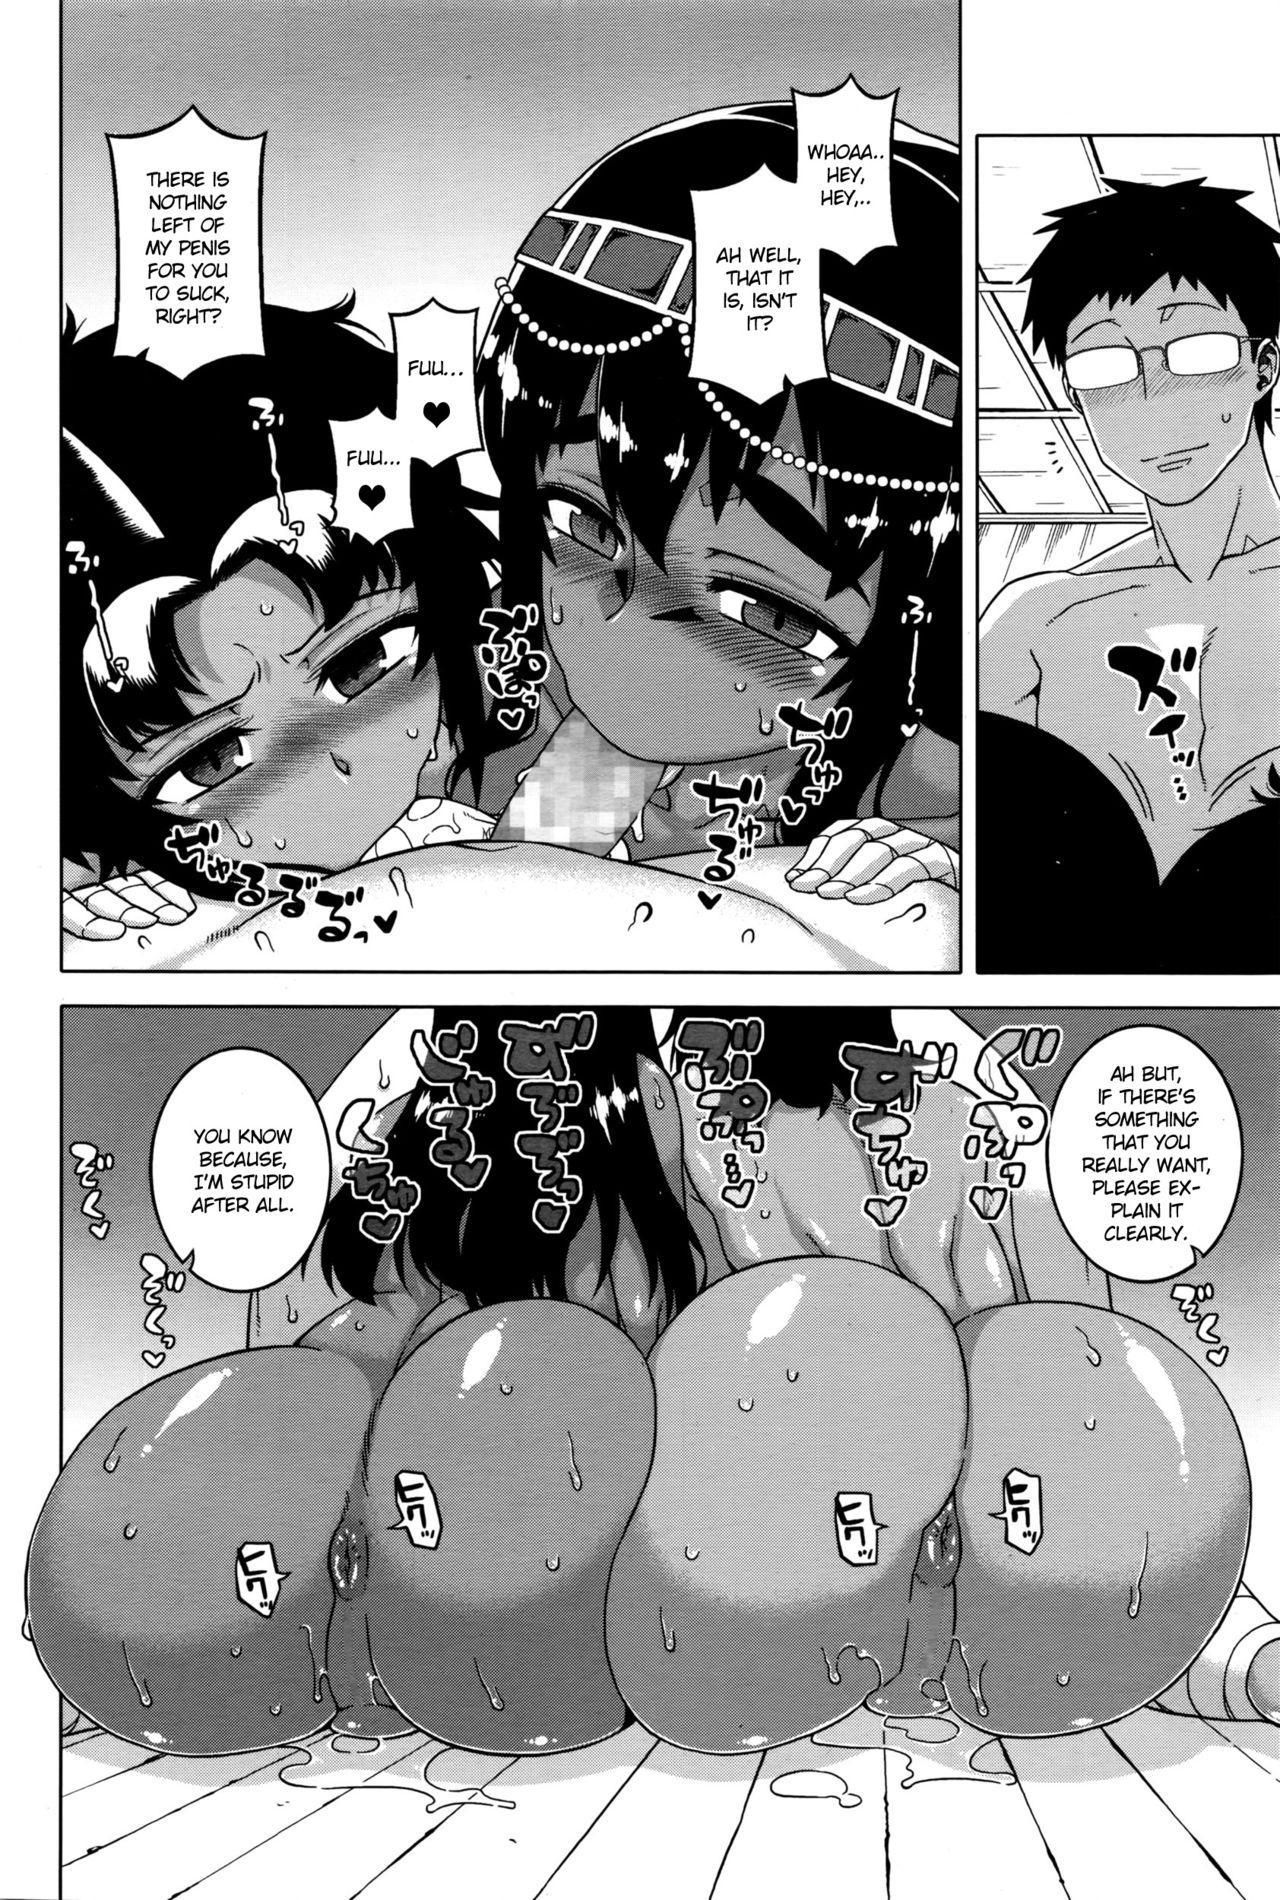 [Takatsu] Masaka Watashi no Pharaoh!?   Impossible, My Master (Pharaoh) is !? (COMIC Megastore Alpha 2016-11) [English] [mgsj123] 11